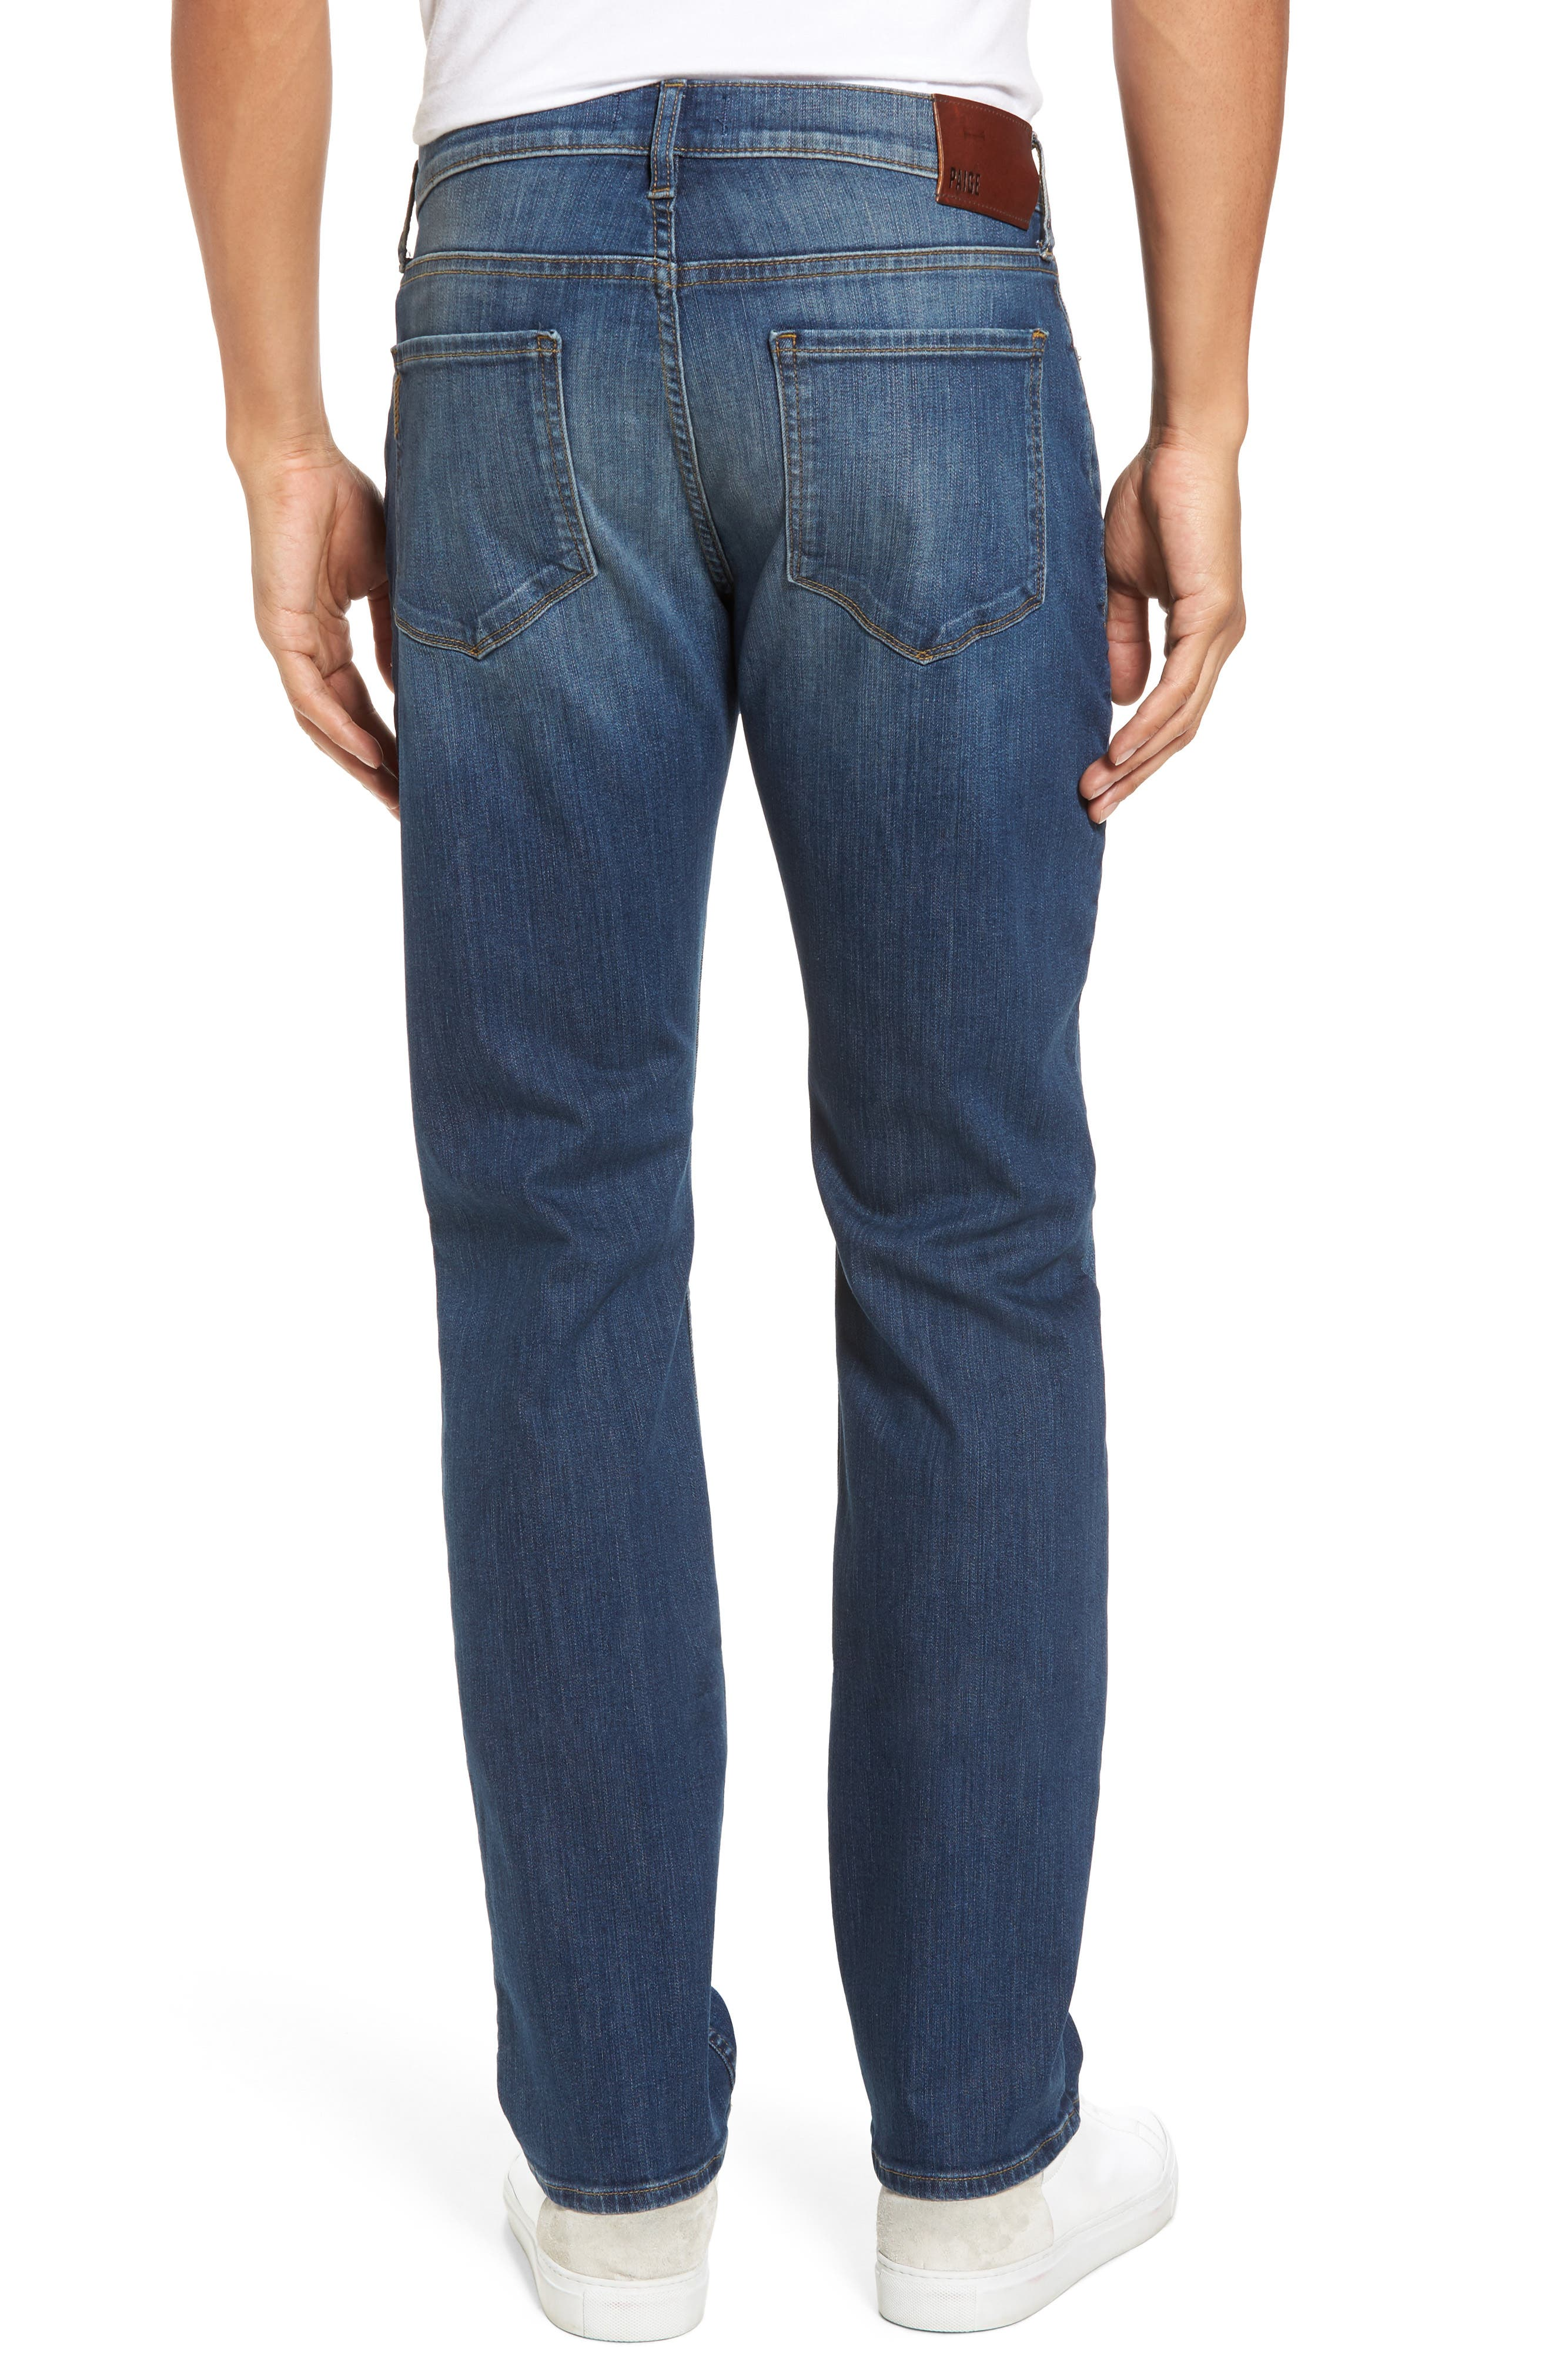 Legacy - Normandie Straight Leg Jeans,                             Alternate thumbnail 2, color,                             400